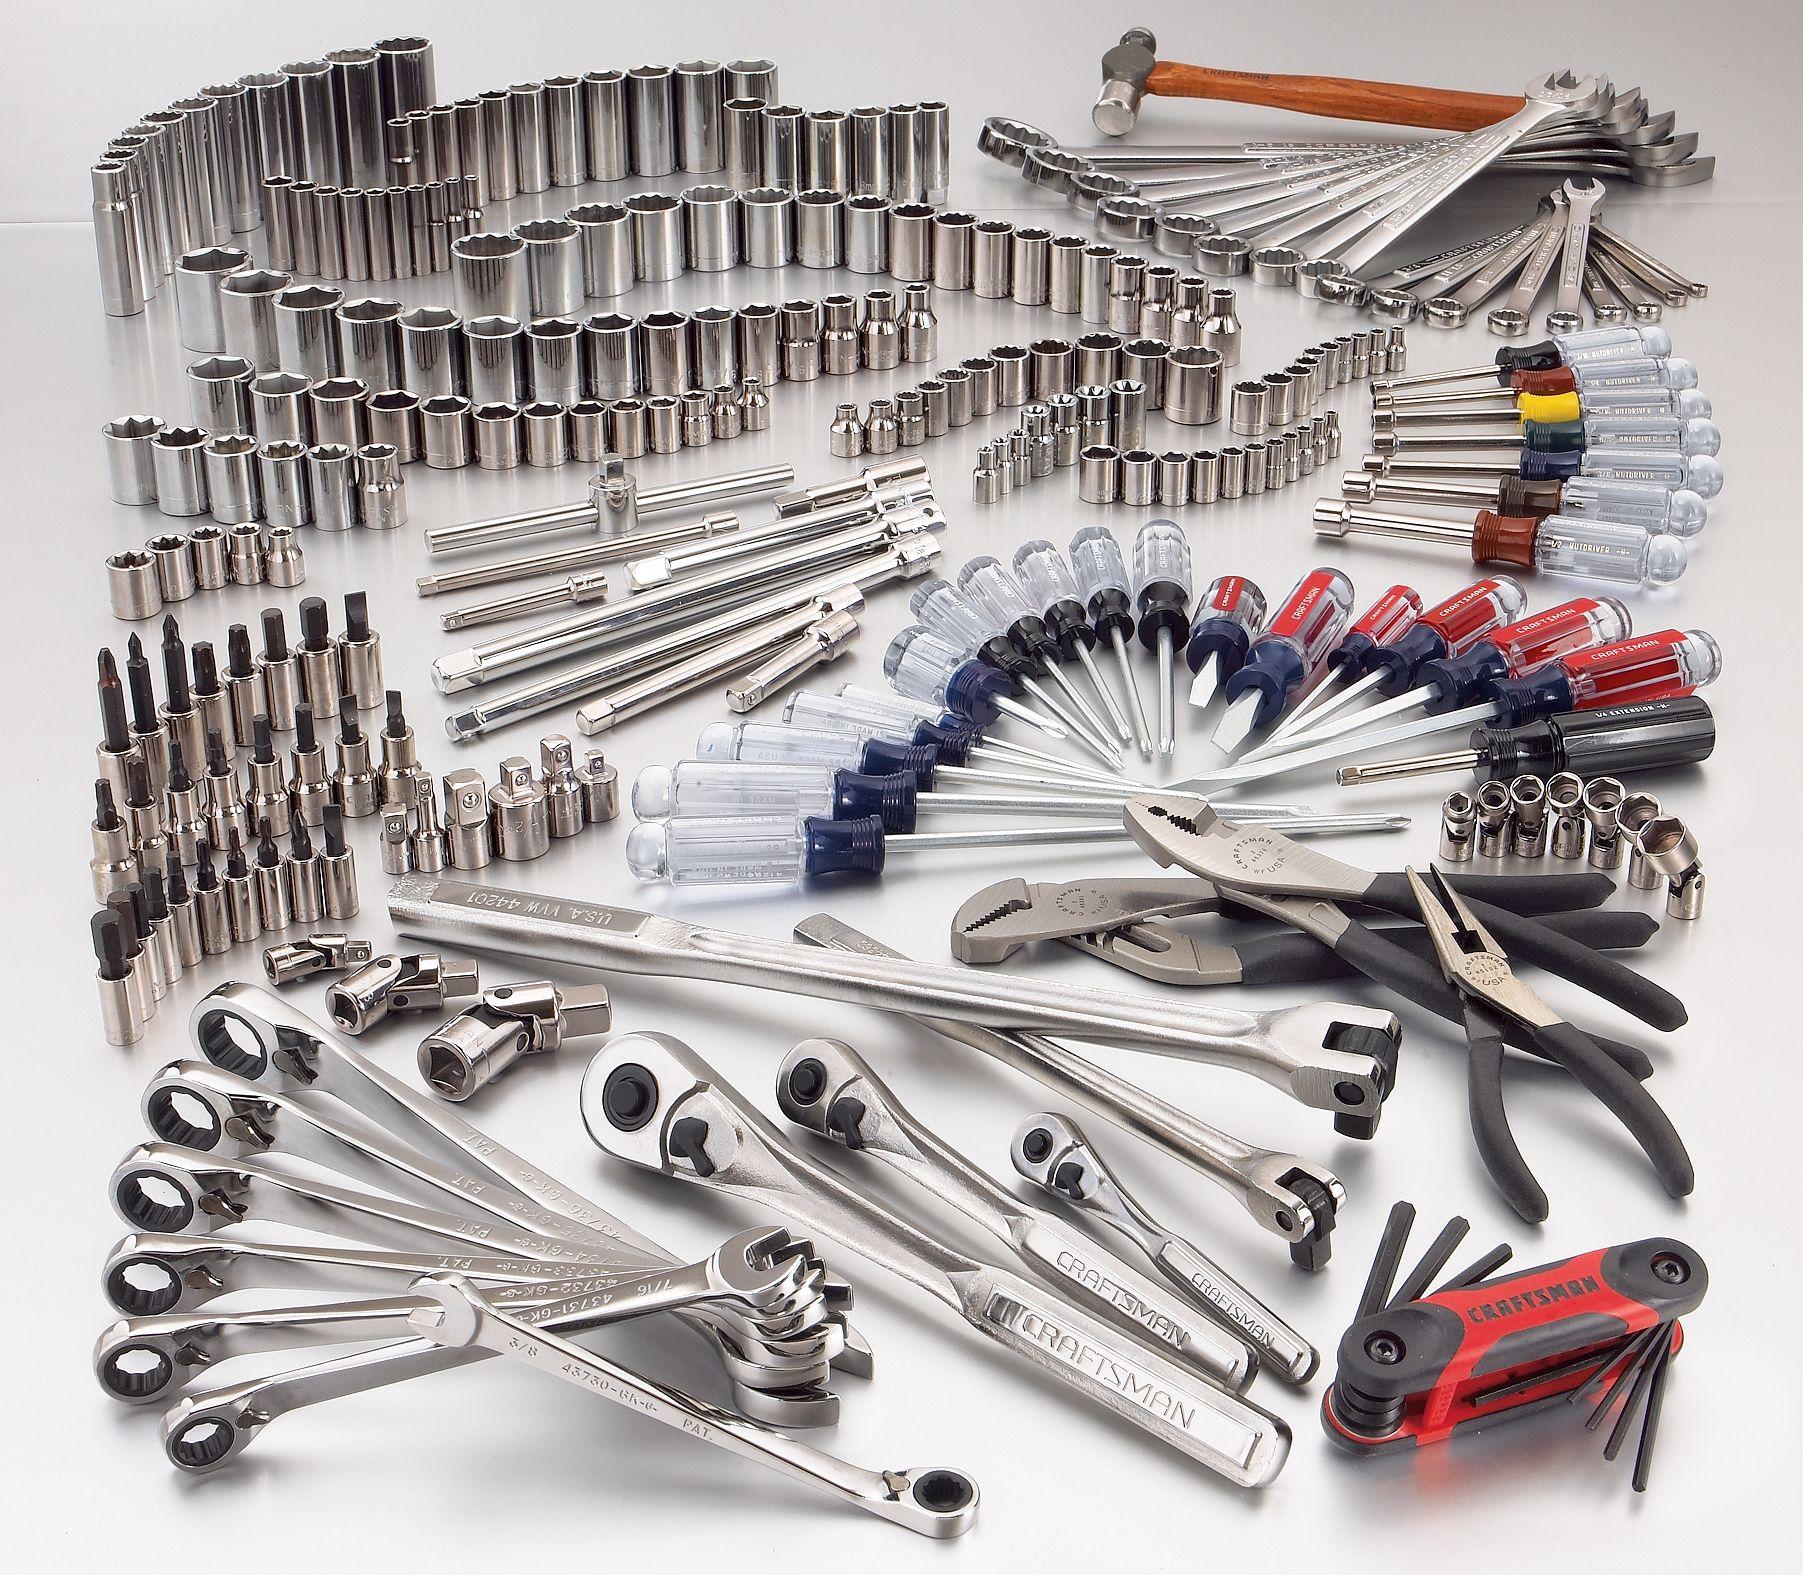 Craftsman 252 Pc Mechanics Tool Set Metric